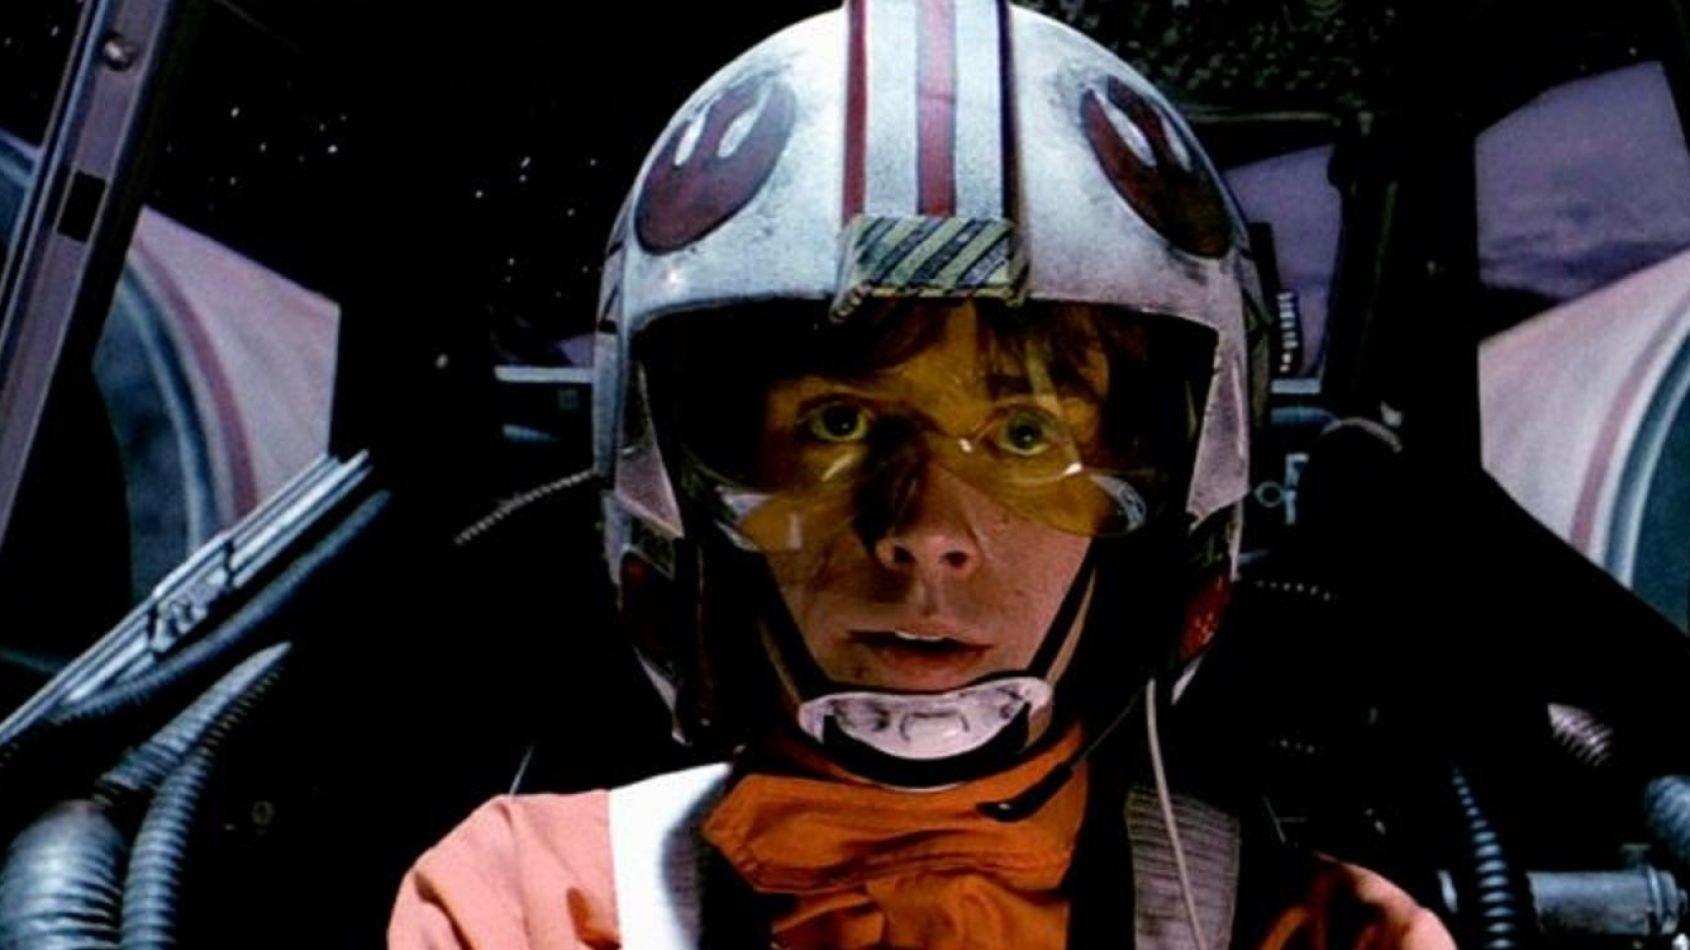 ANOVOS met Luke Skywalker à l'honneur !!!